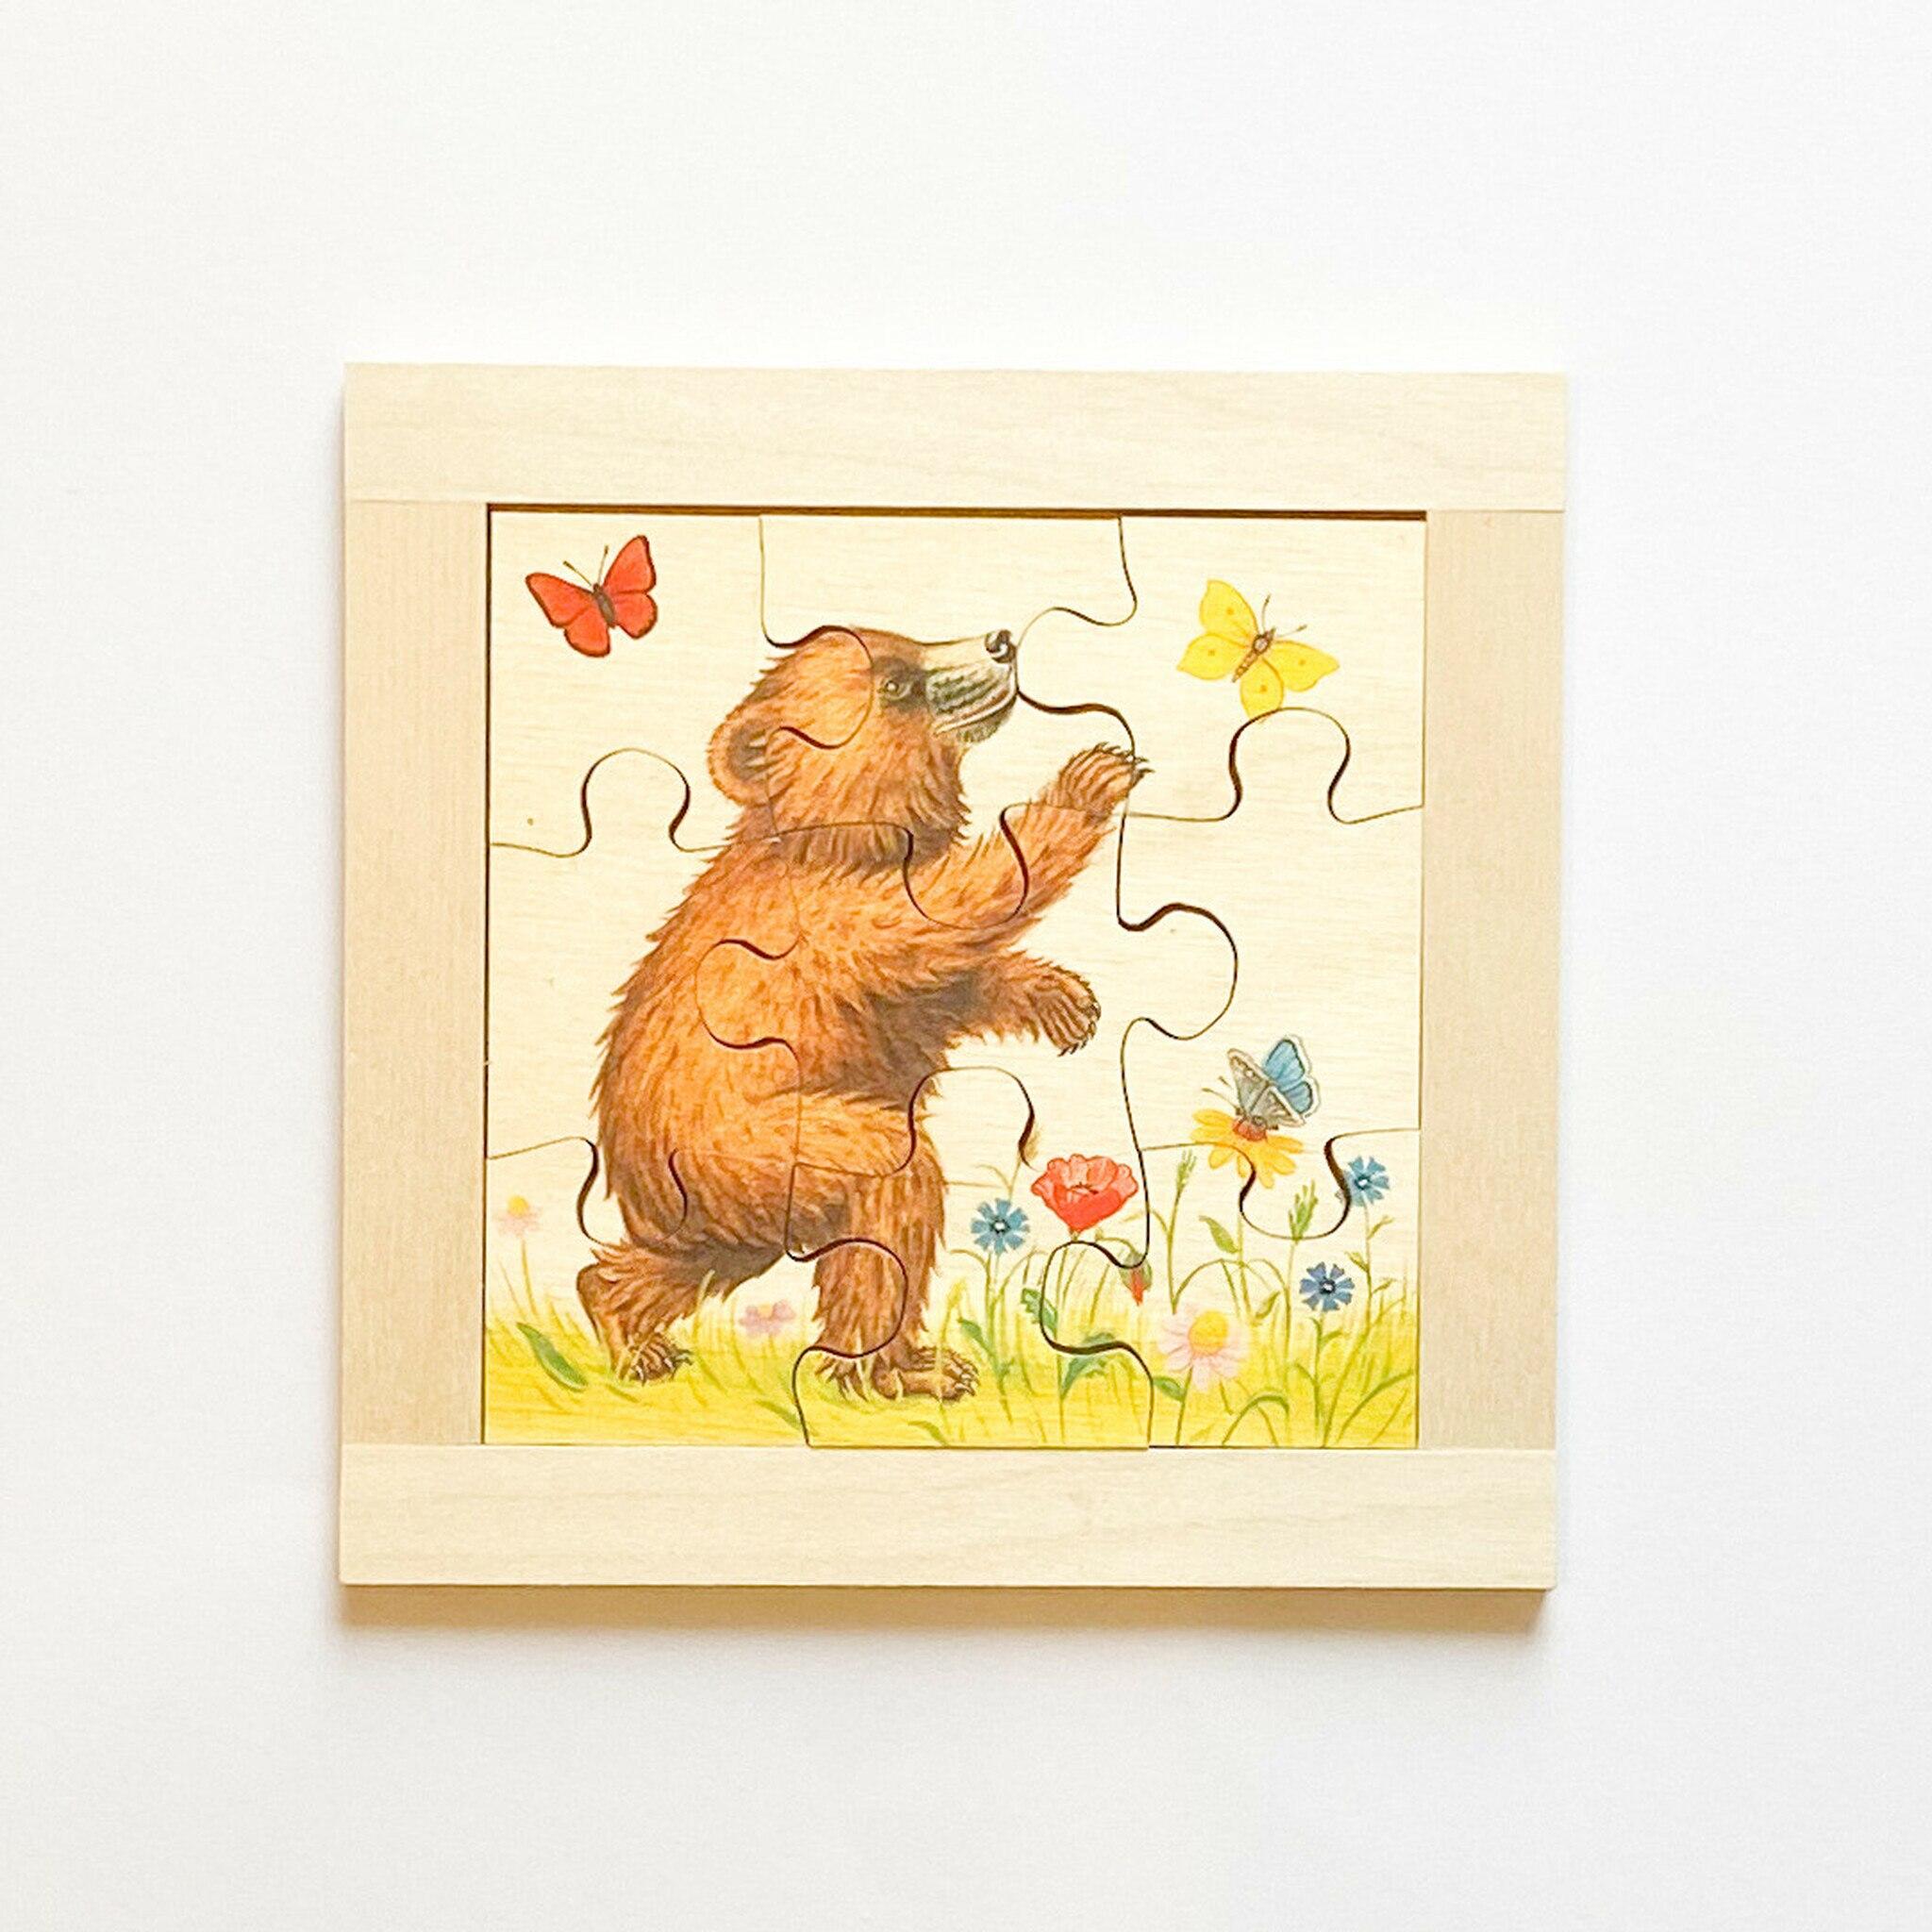 Atelier Fischer Magic Box Mosaic Flat Puzzle Bears, 9 pcs, Made in Switzerland